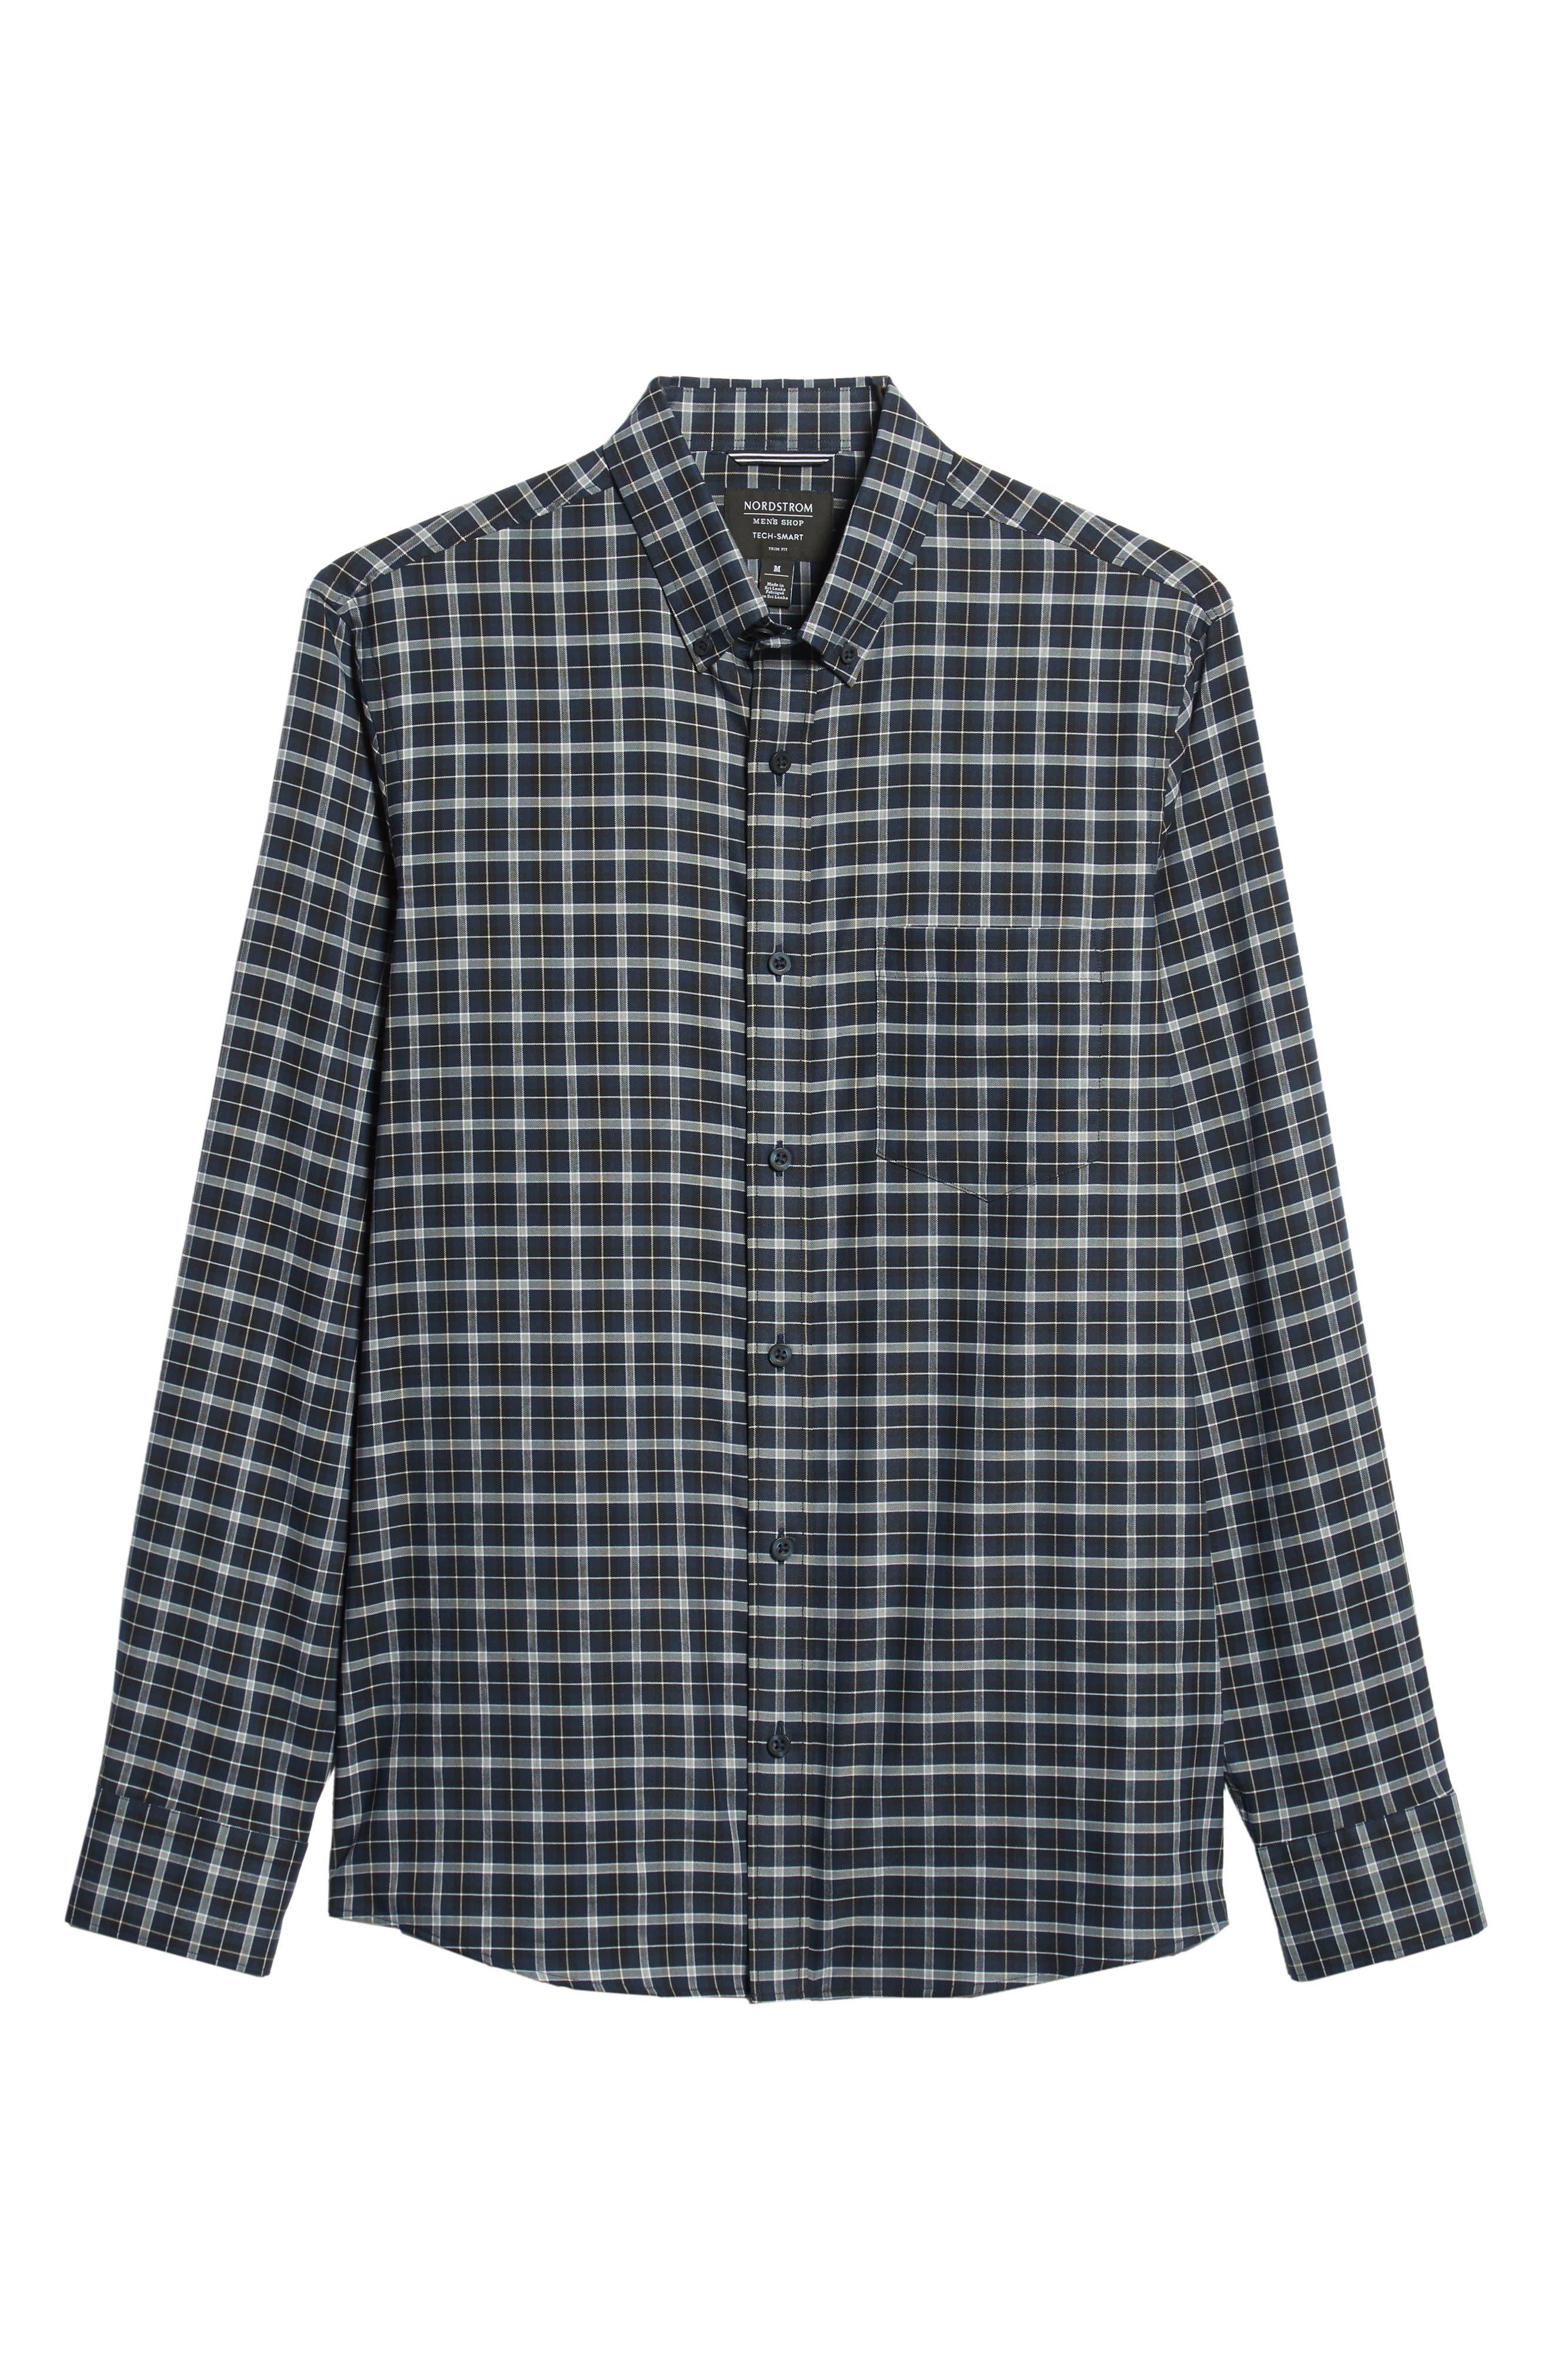 NORDSTROM MEN'S SHOP, Tech-Smart Slim Fit Check Sport Shirt, Alternate thumbnail 5, color, NAVY IRIS BLACK CHECK